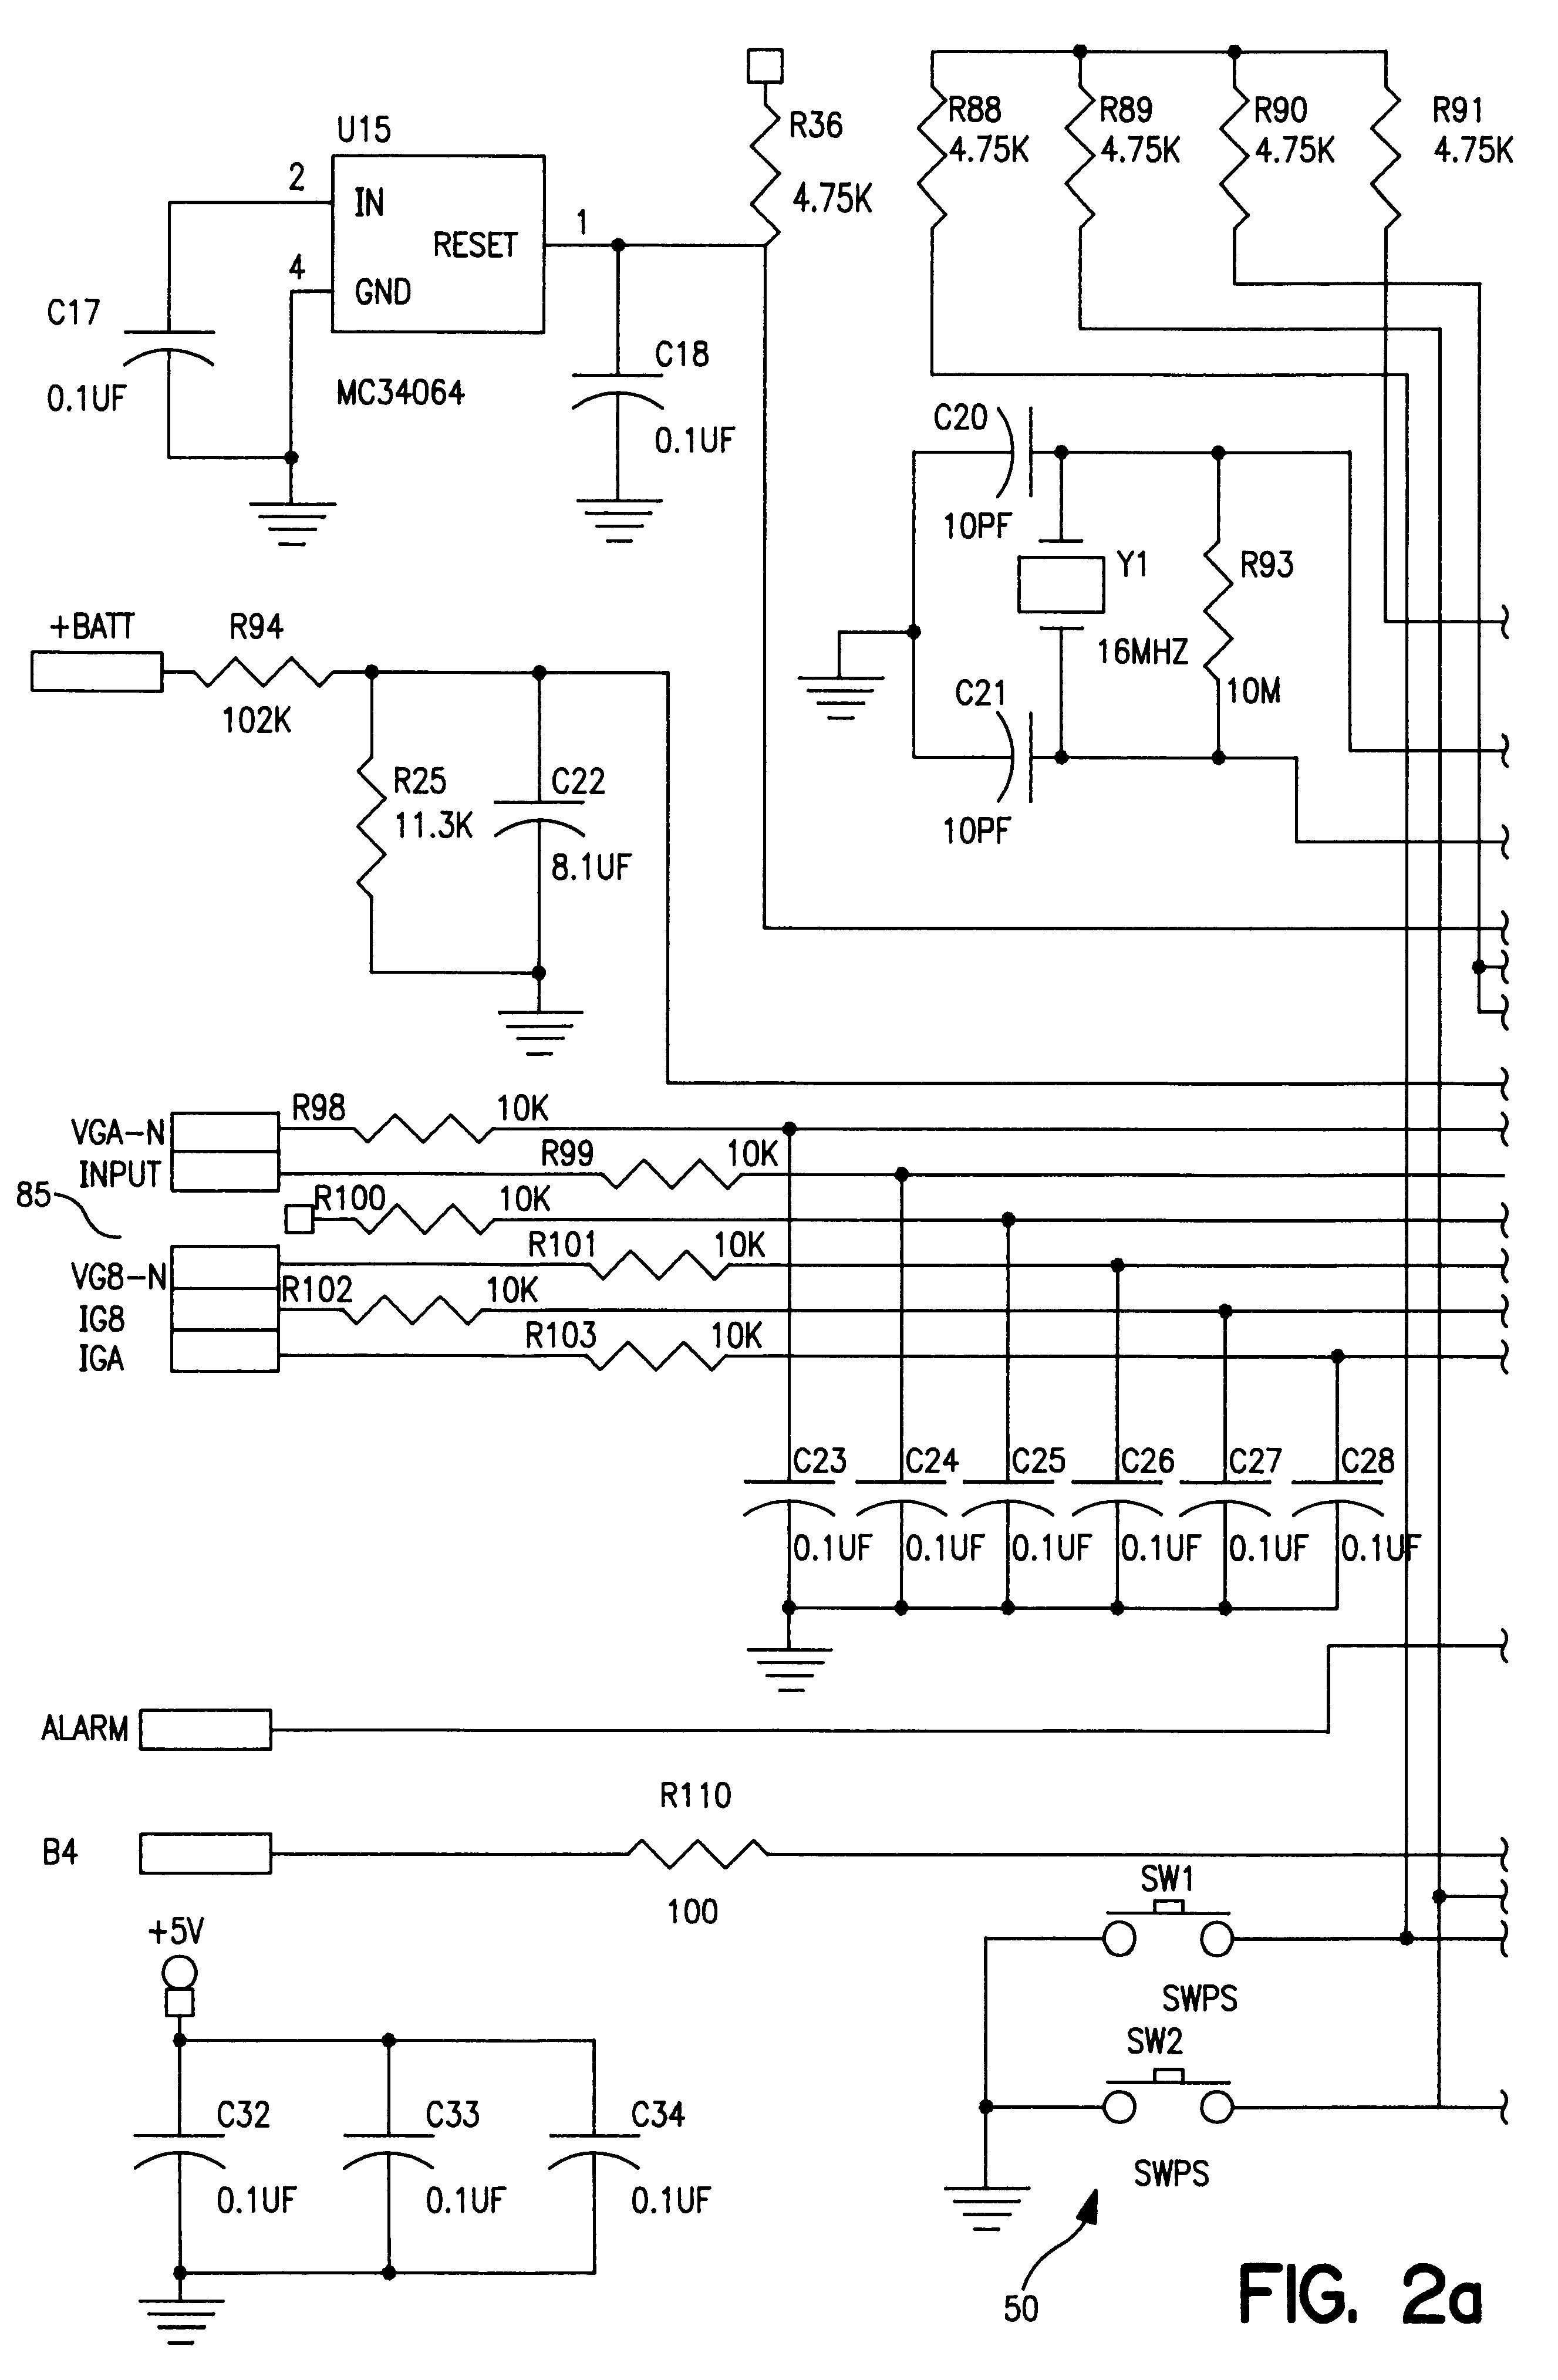 Generac Manual Transfer Switch Wiring Diagram - Queen-Int - Generac Manual Transfer Switch Wiring Diagram